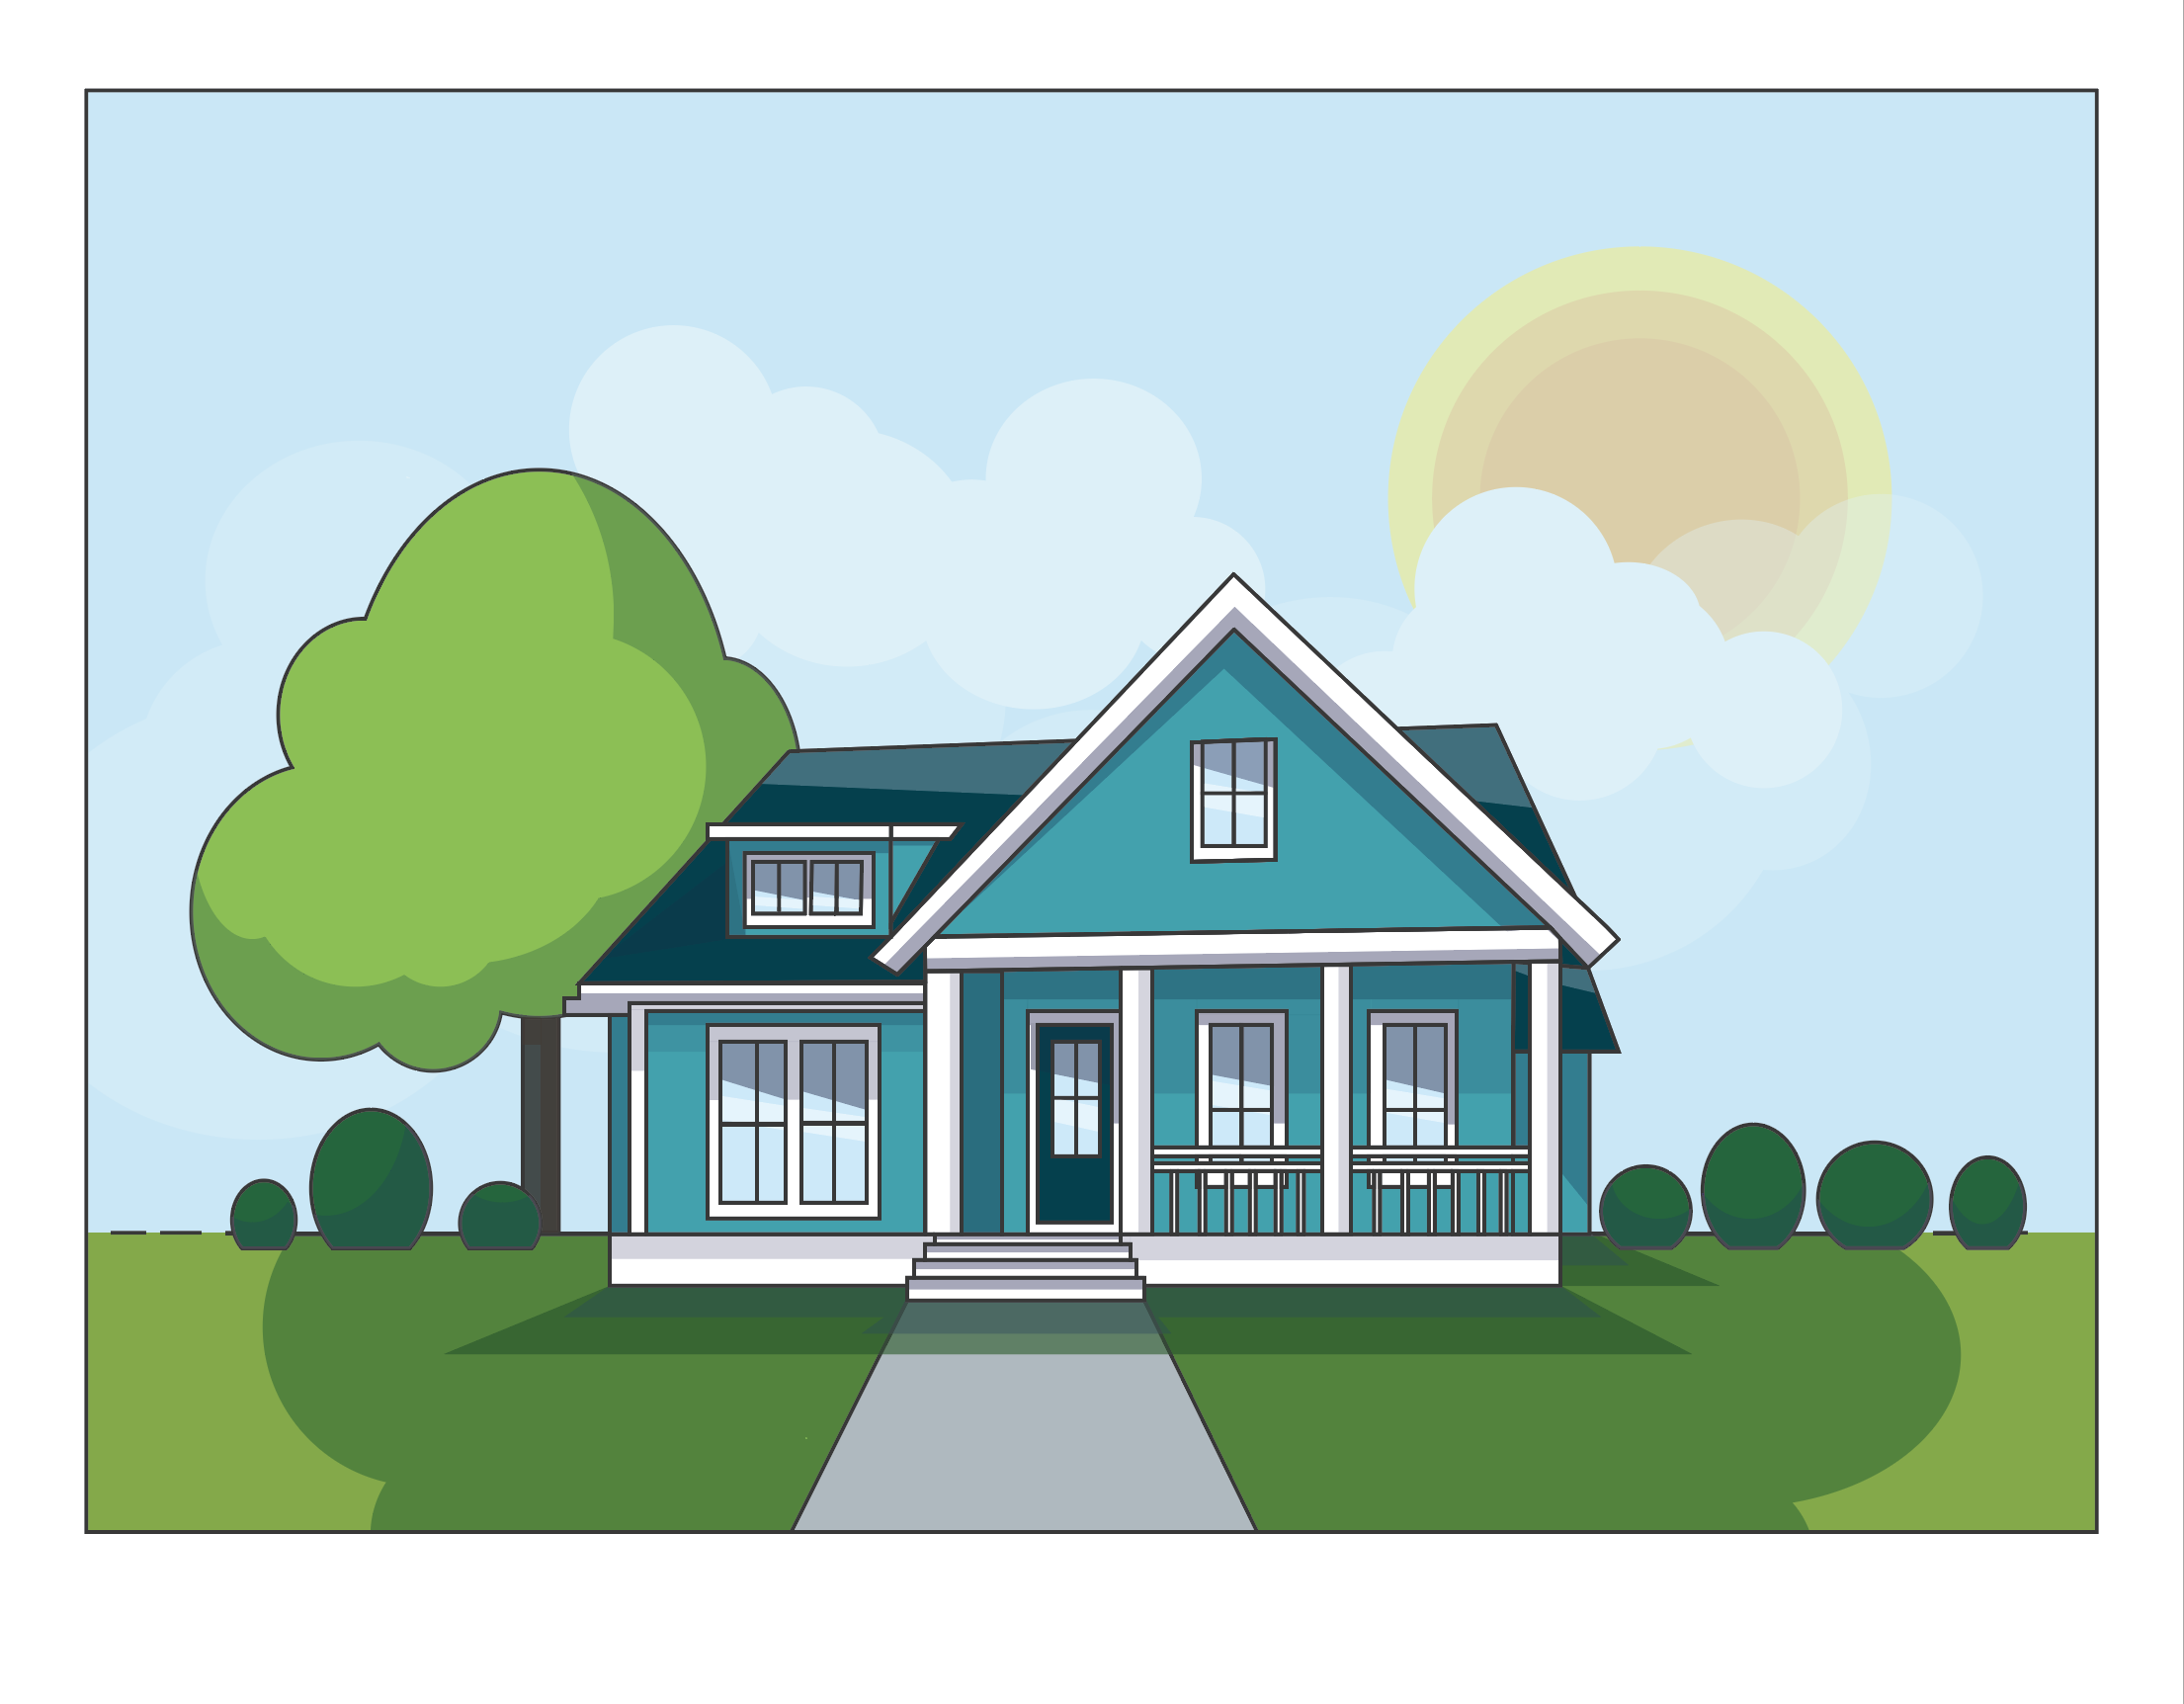 High School Lesson Plan: Flat House in Illustrator